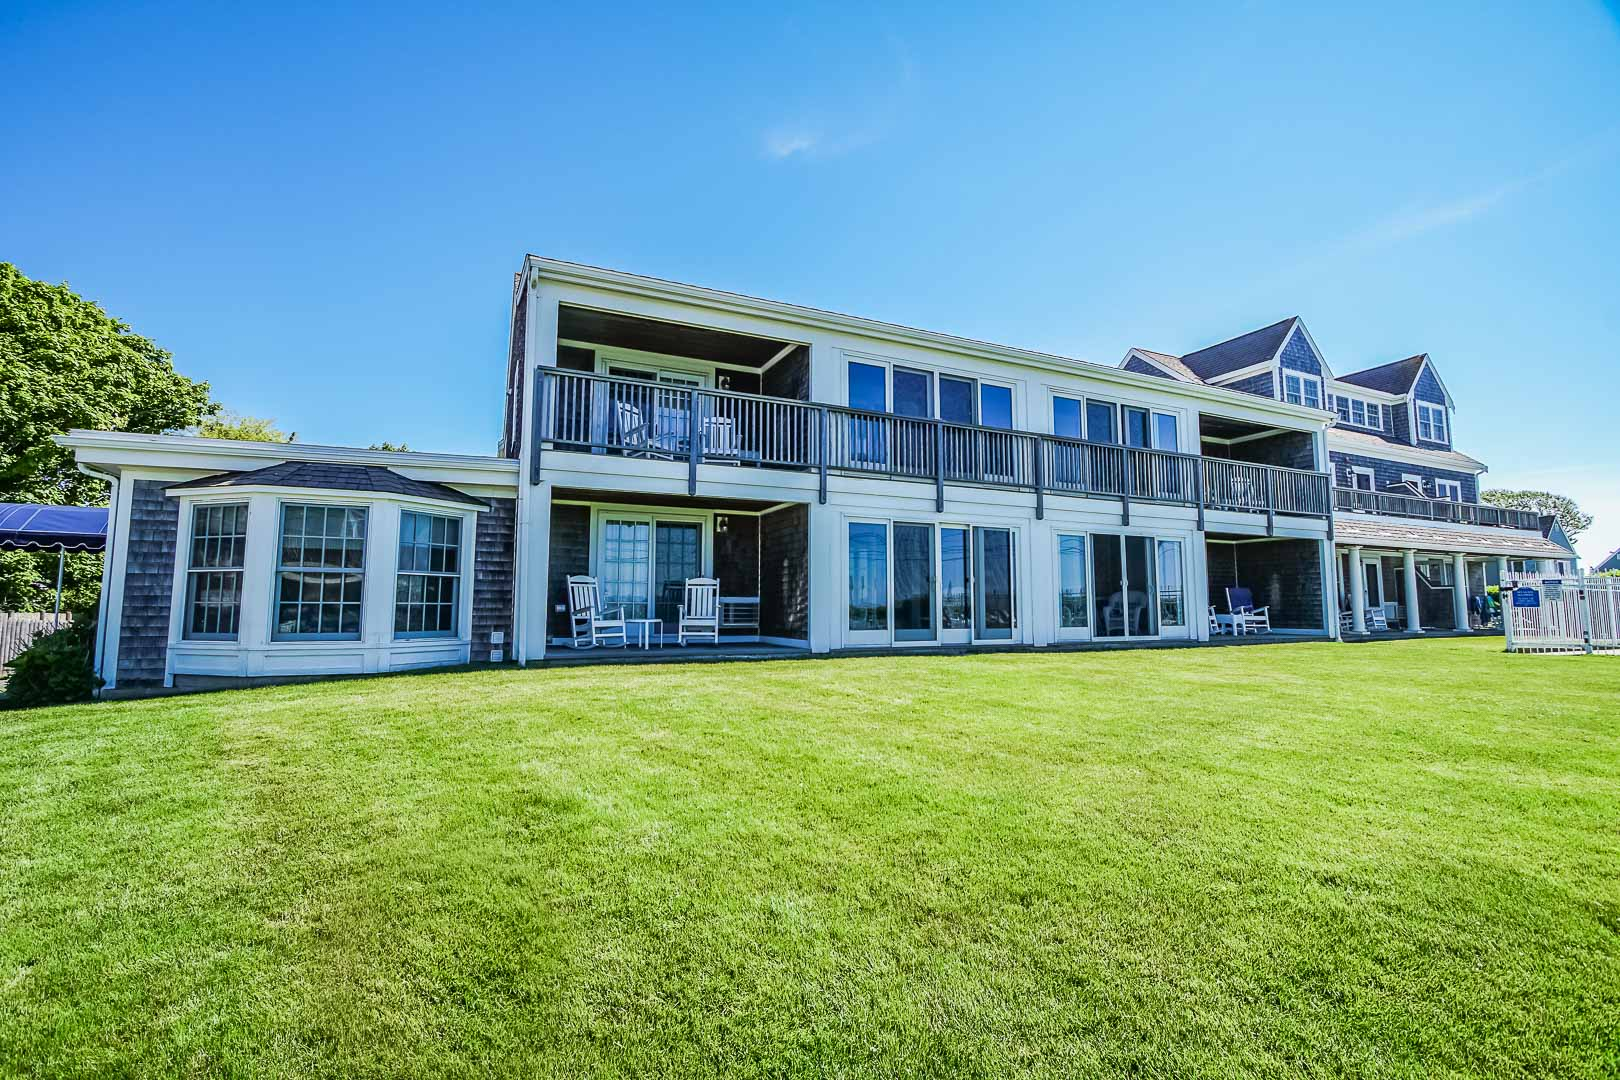 A scenice view of VRI's Beachside Village Resort in Massachusetts.